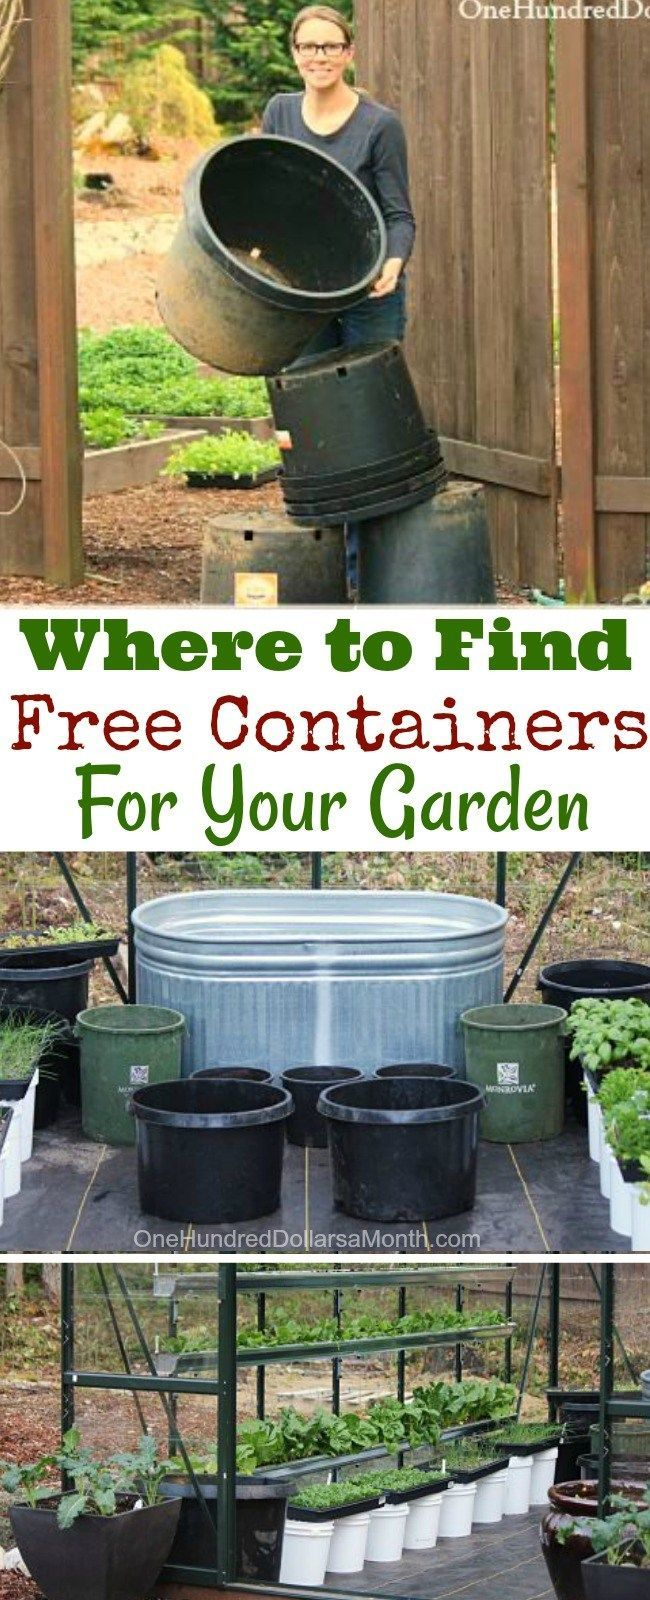 Gardening Hacks, Where To Find Free Containers, Free Garden Supplies,  Gardening 101,